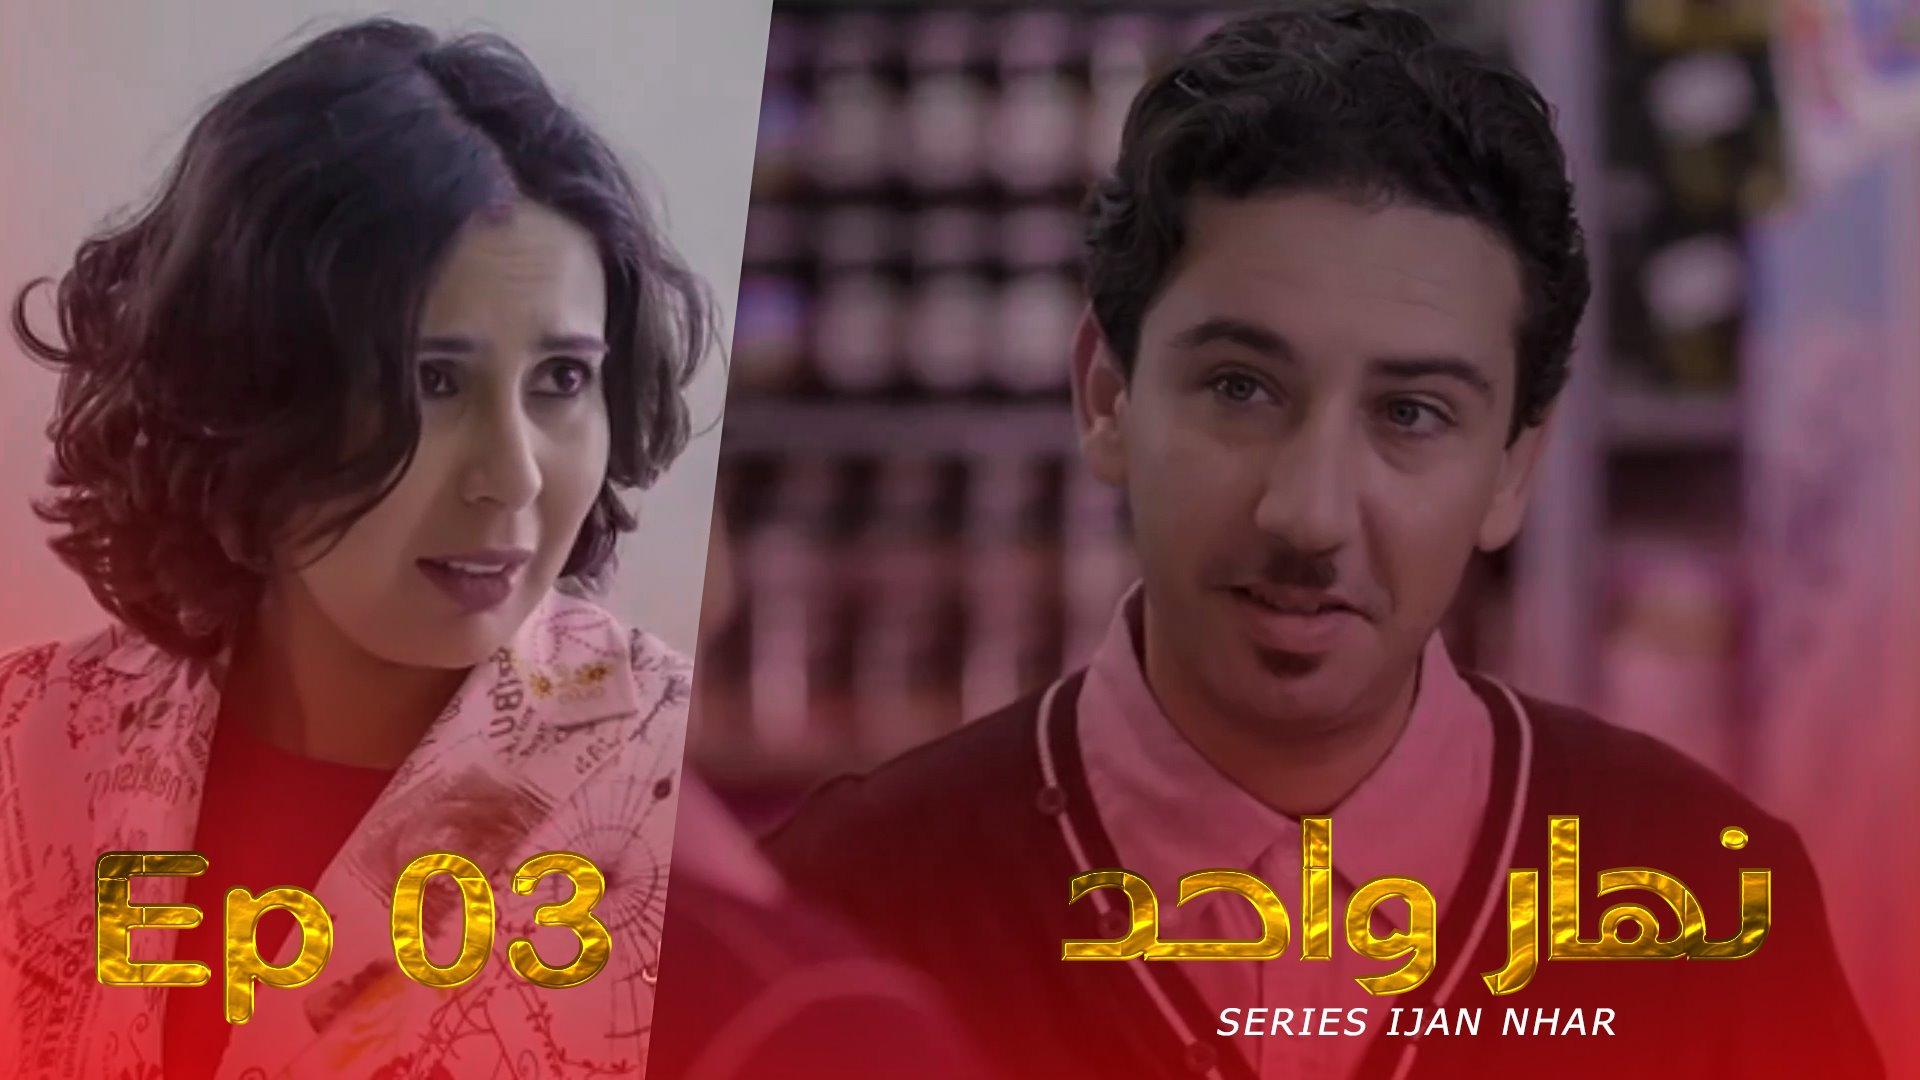 "Series Ijan Nhar ( Film Rif 2019 ) - Ep03| المسلسل الريفي"" نهار واحد"" الحلقة الثالثة"